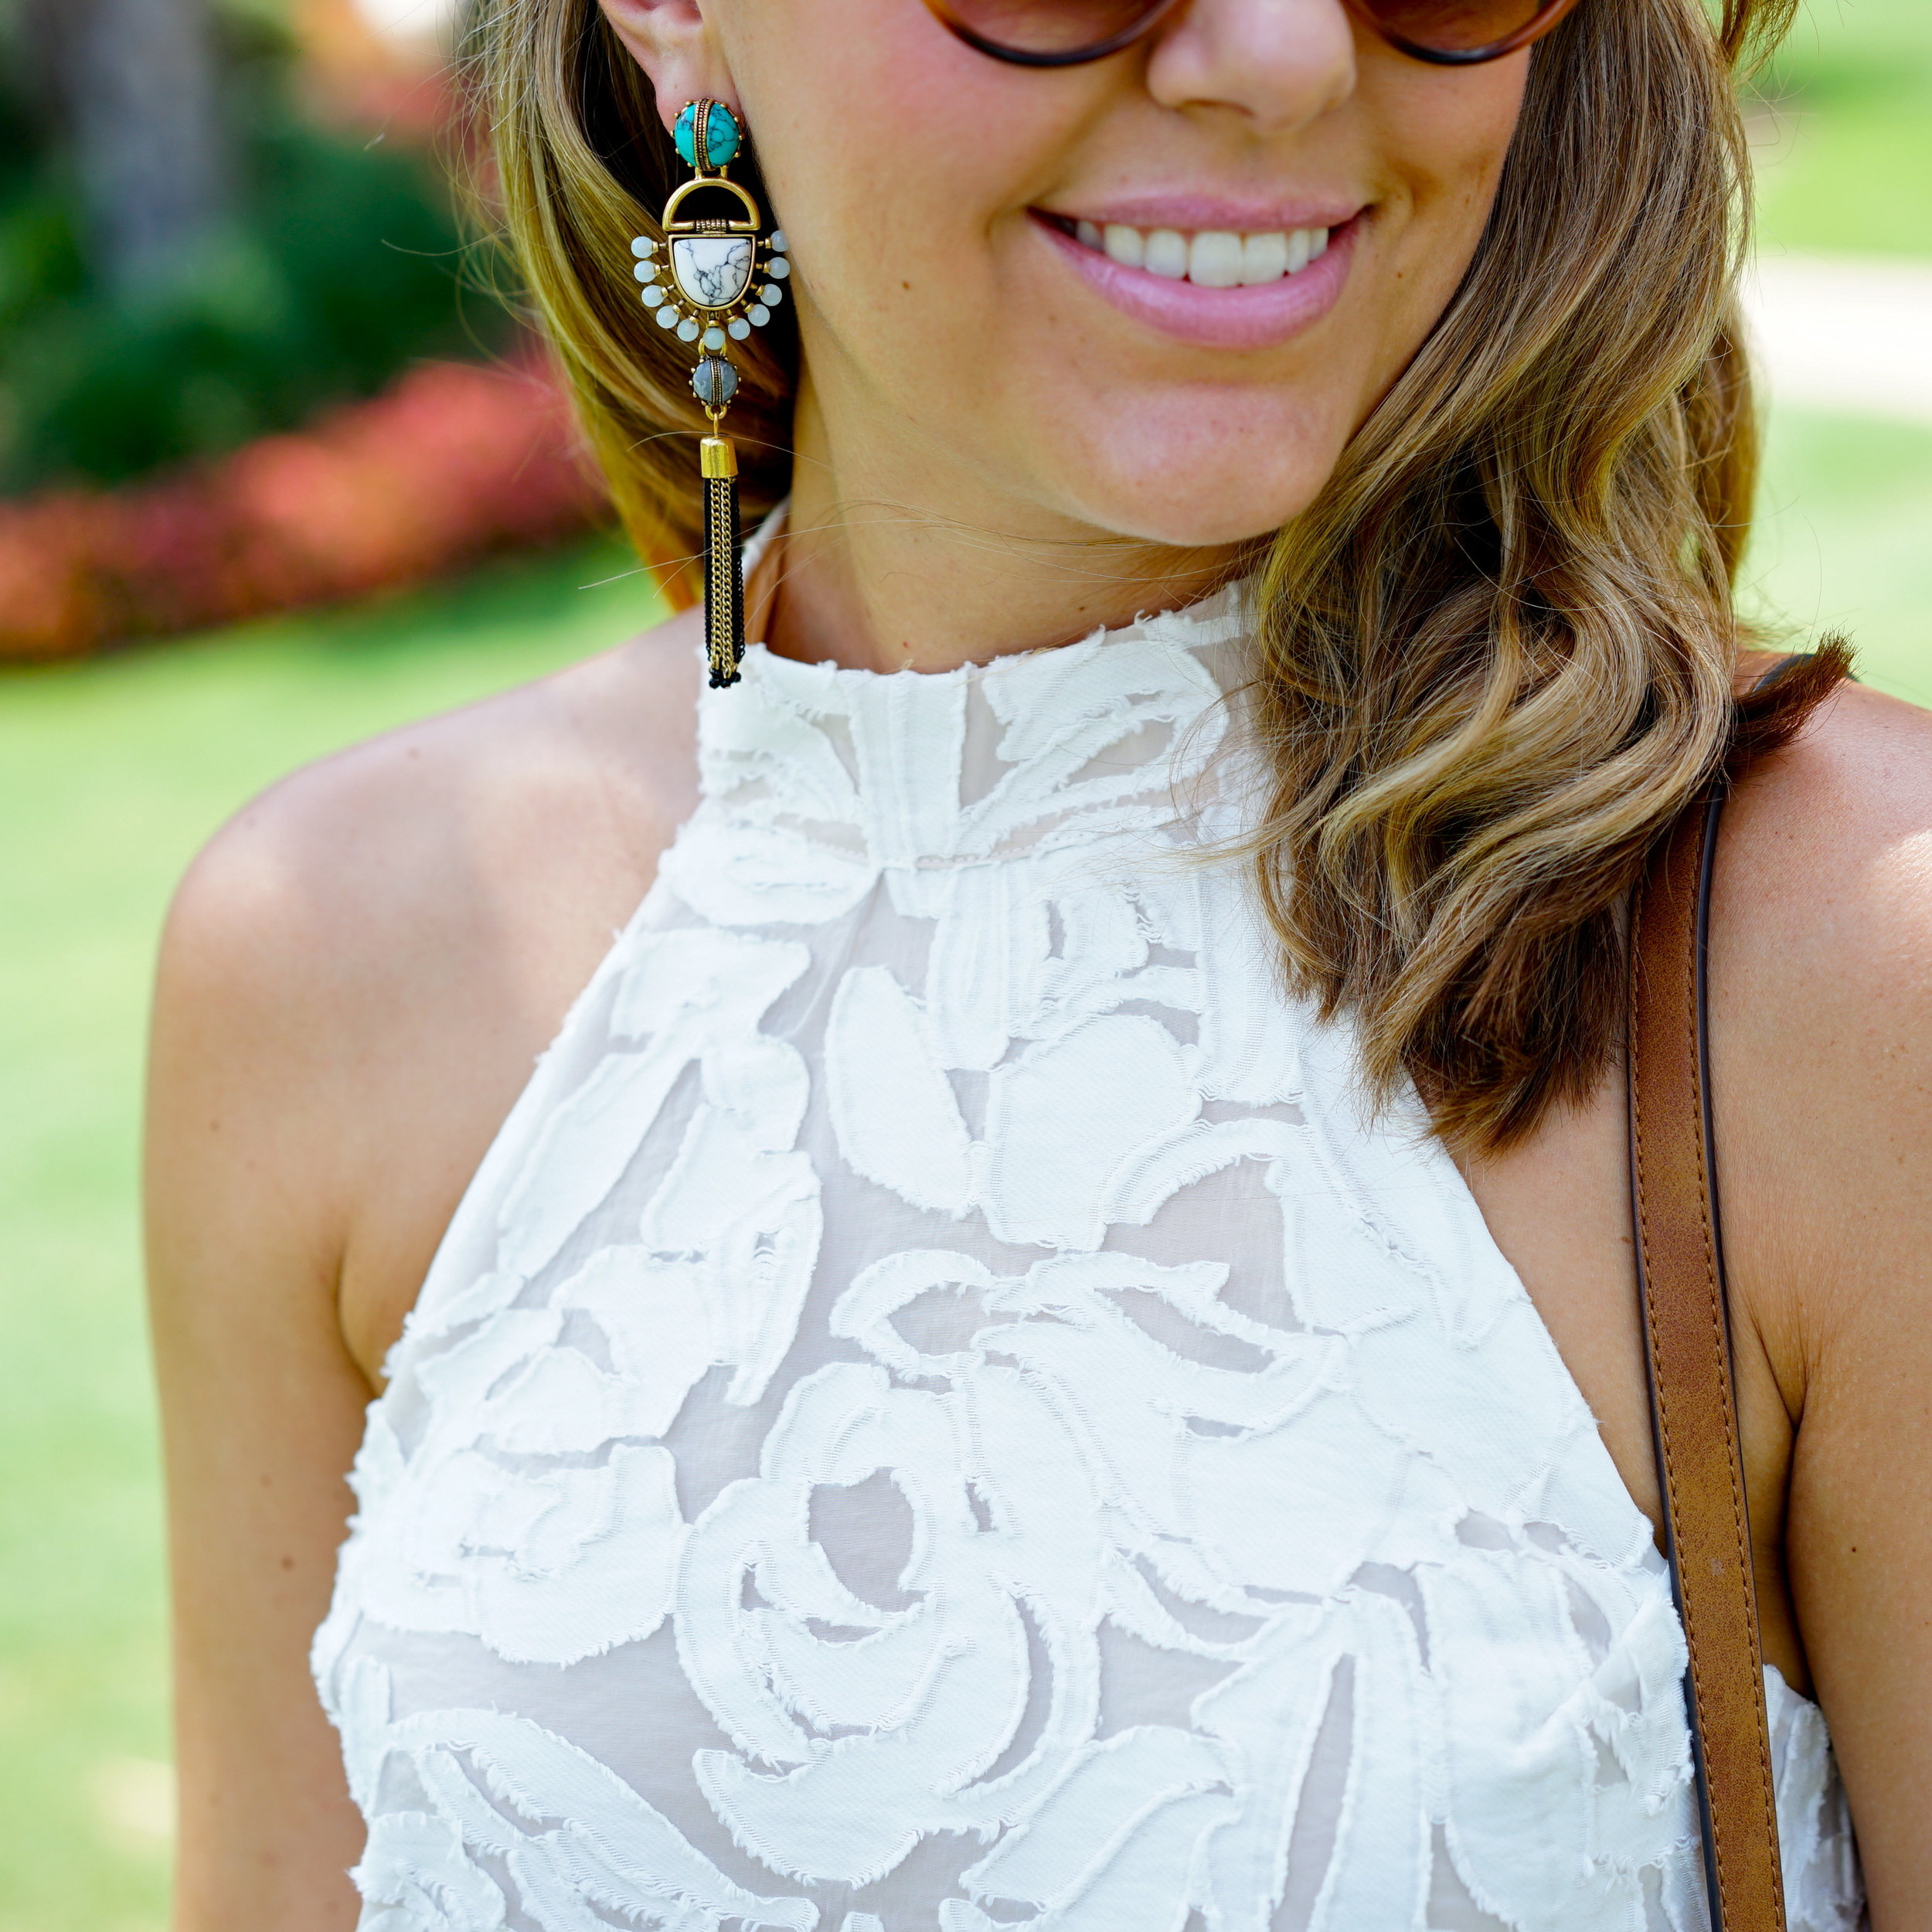 Ivory textured halter dress, turquoise earrings